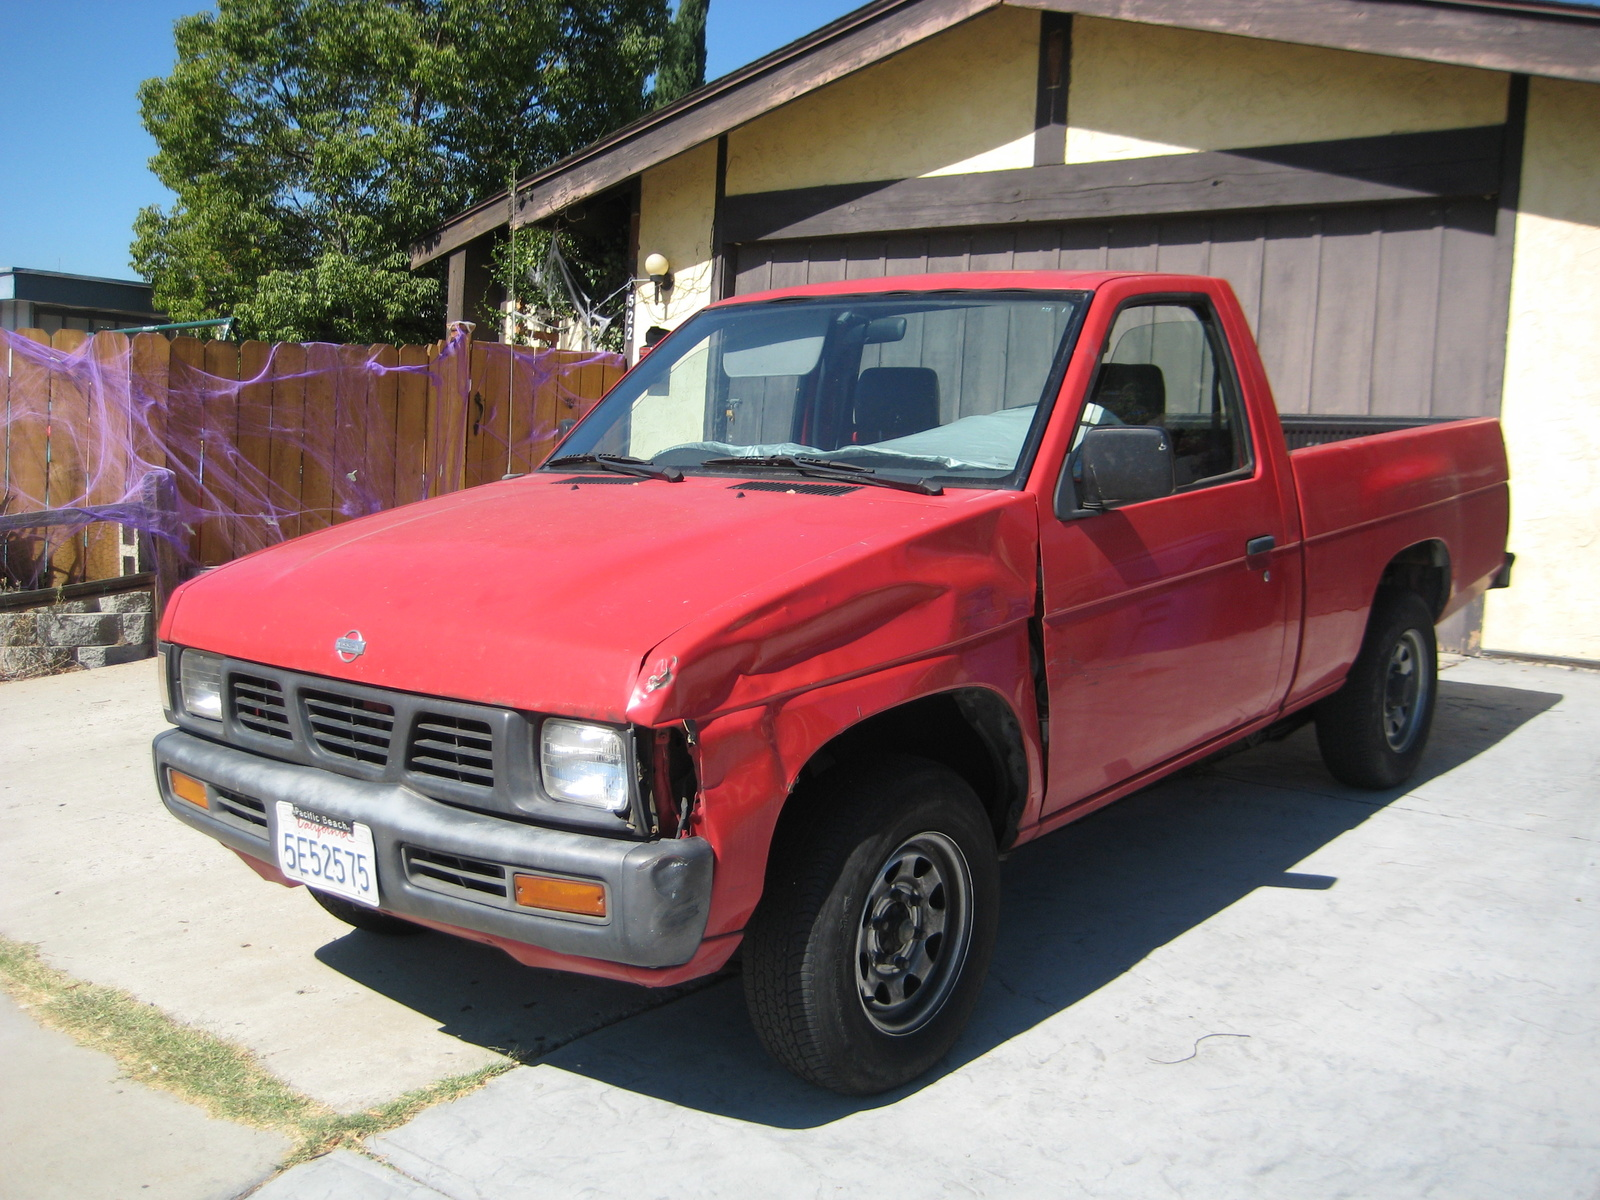 1995 nissan truck 11 nissan truck 11